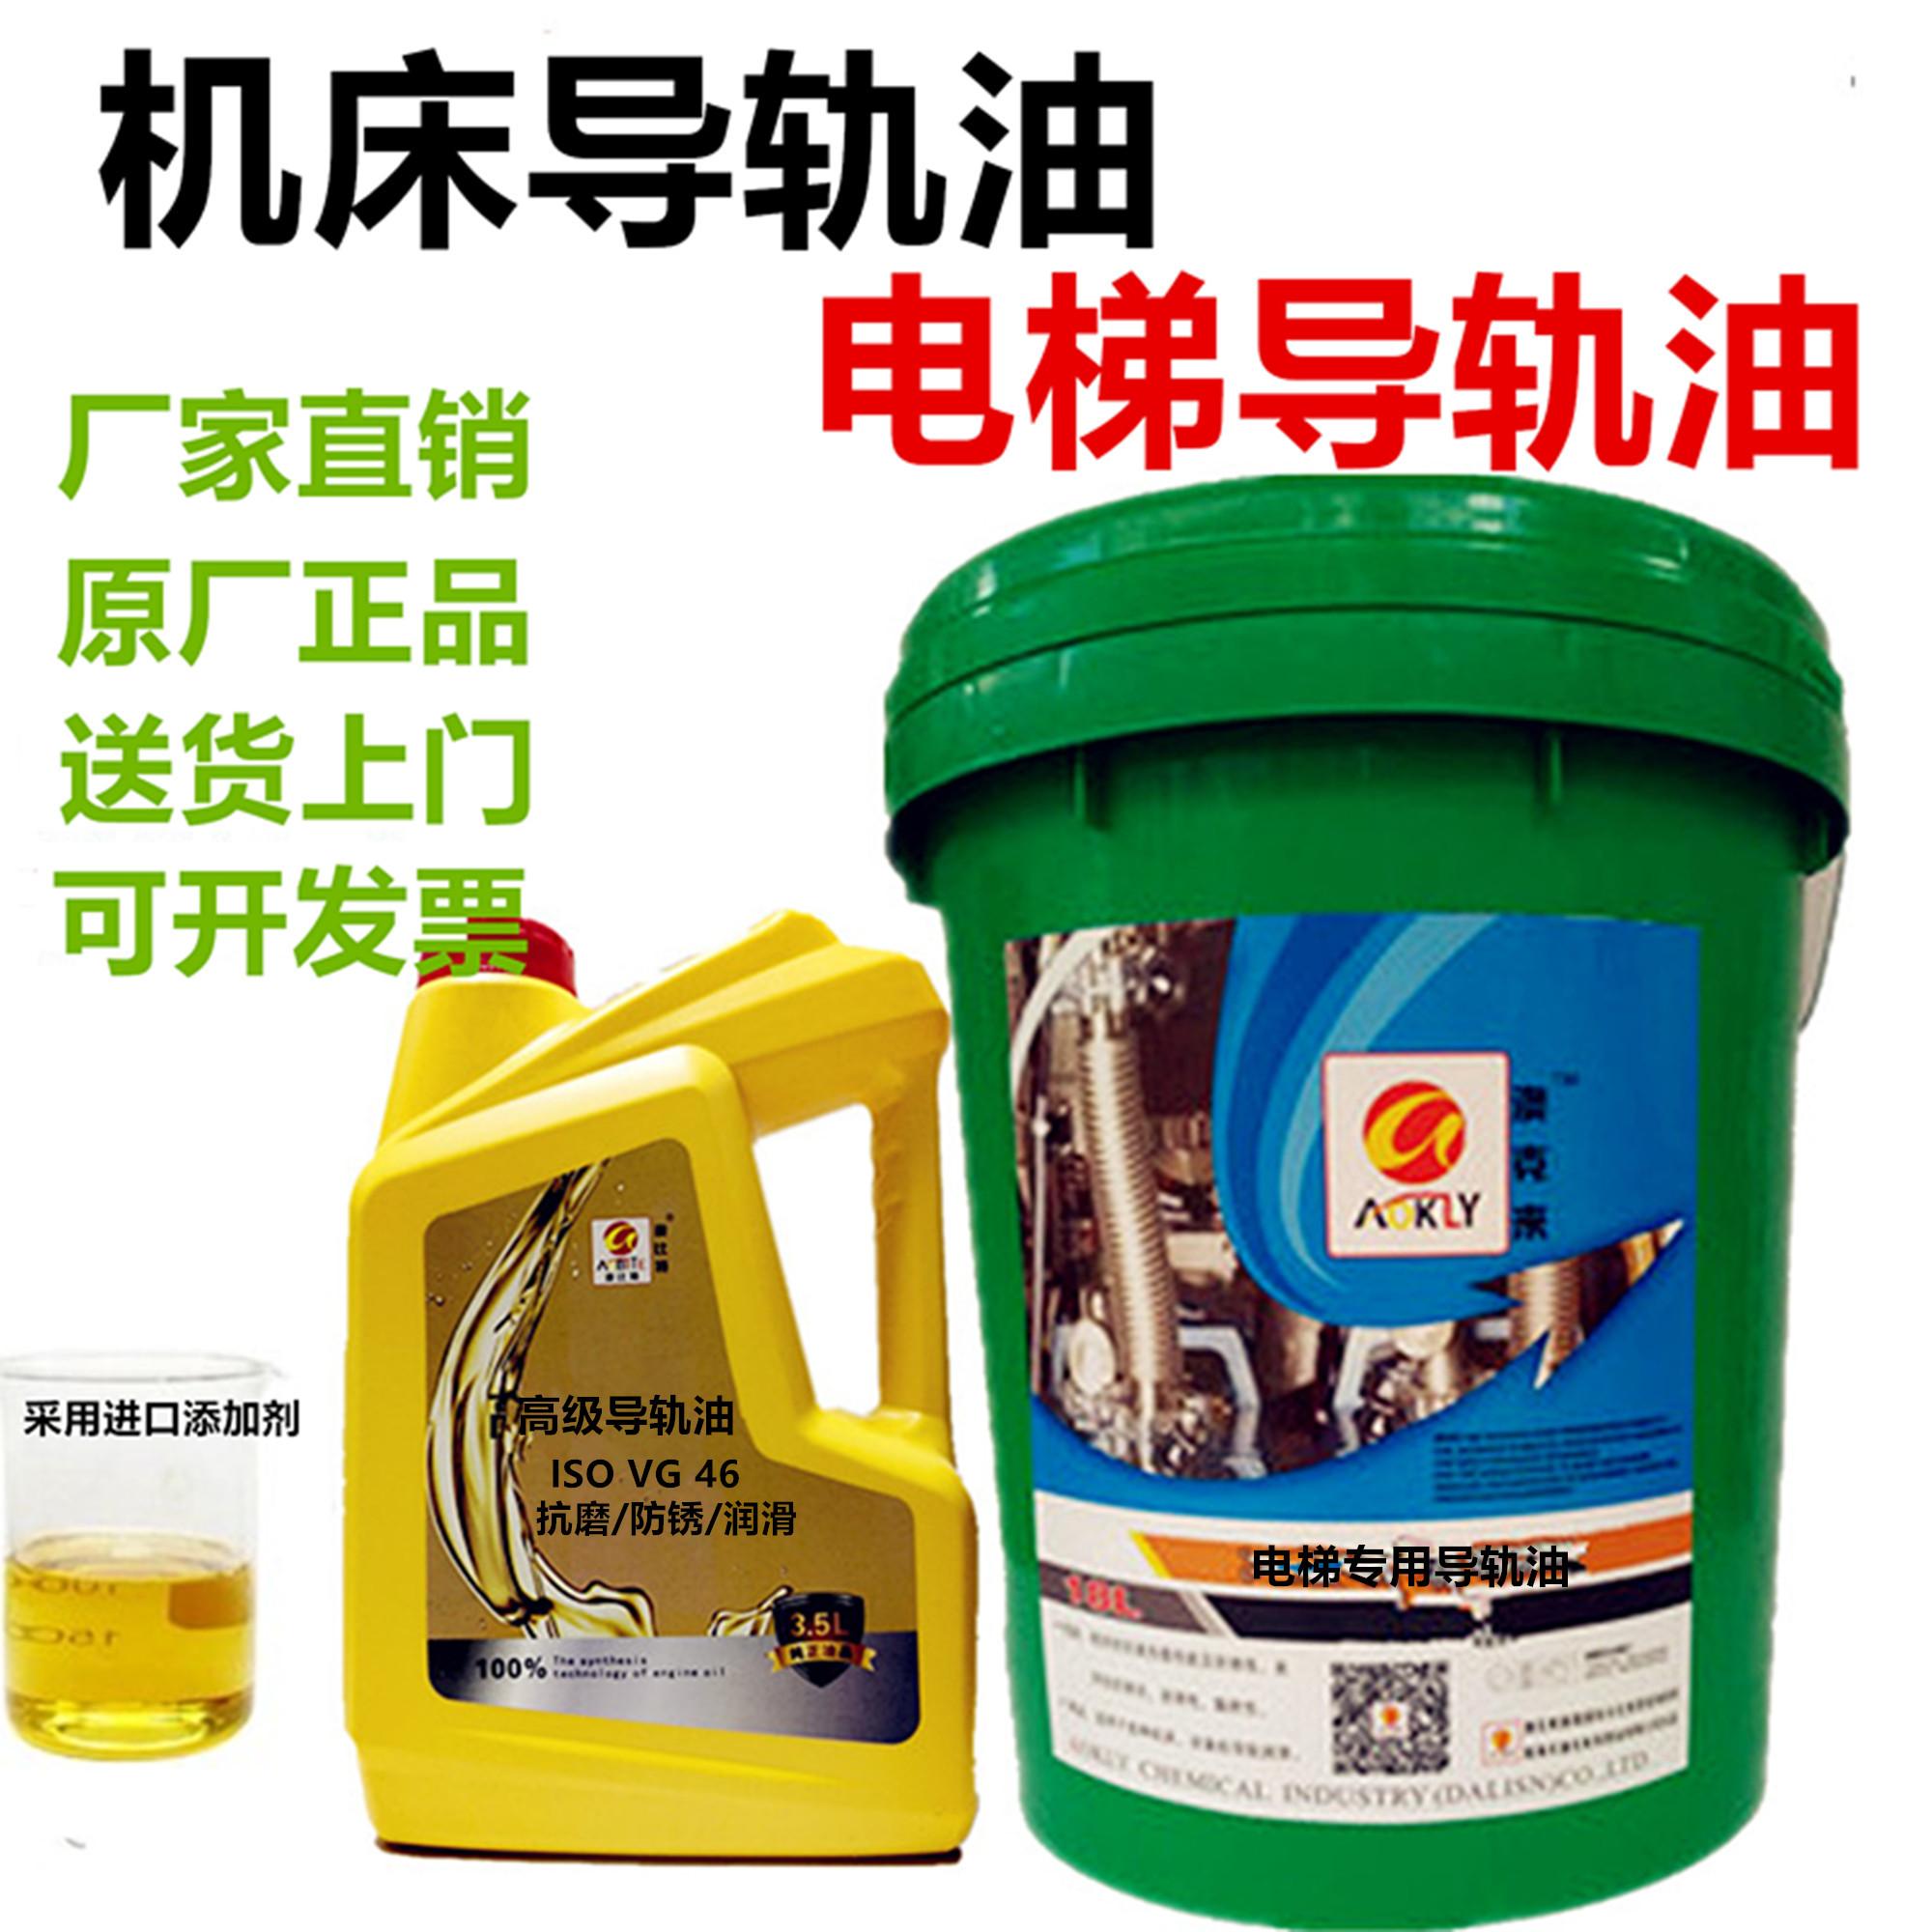 Rail oil No. 68 machine grinder CNC rail oil 46 elevator rail oil 32 mechanical lubricants